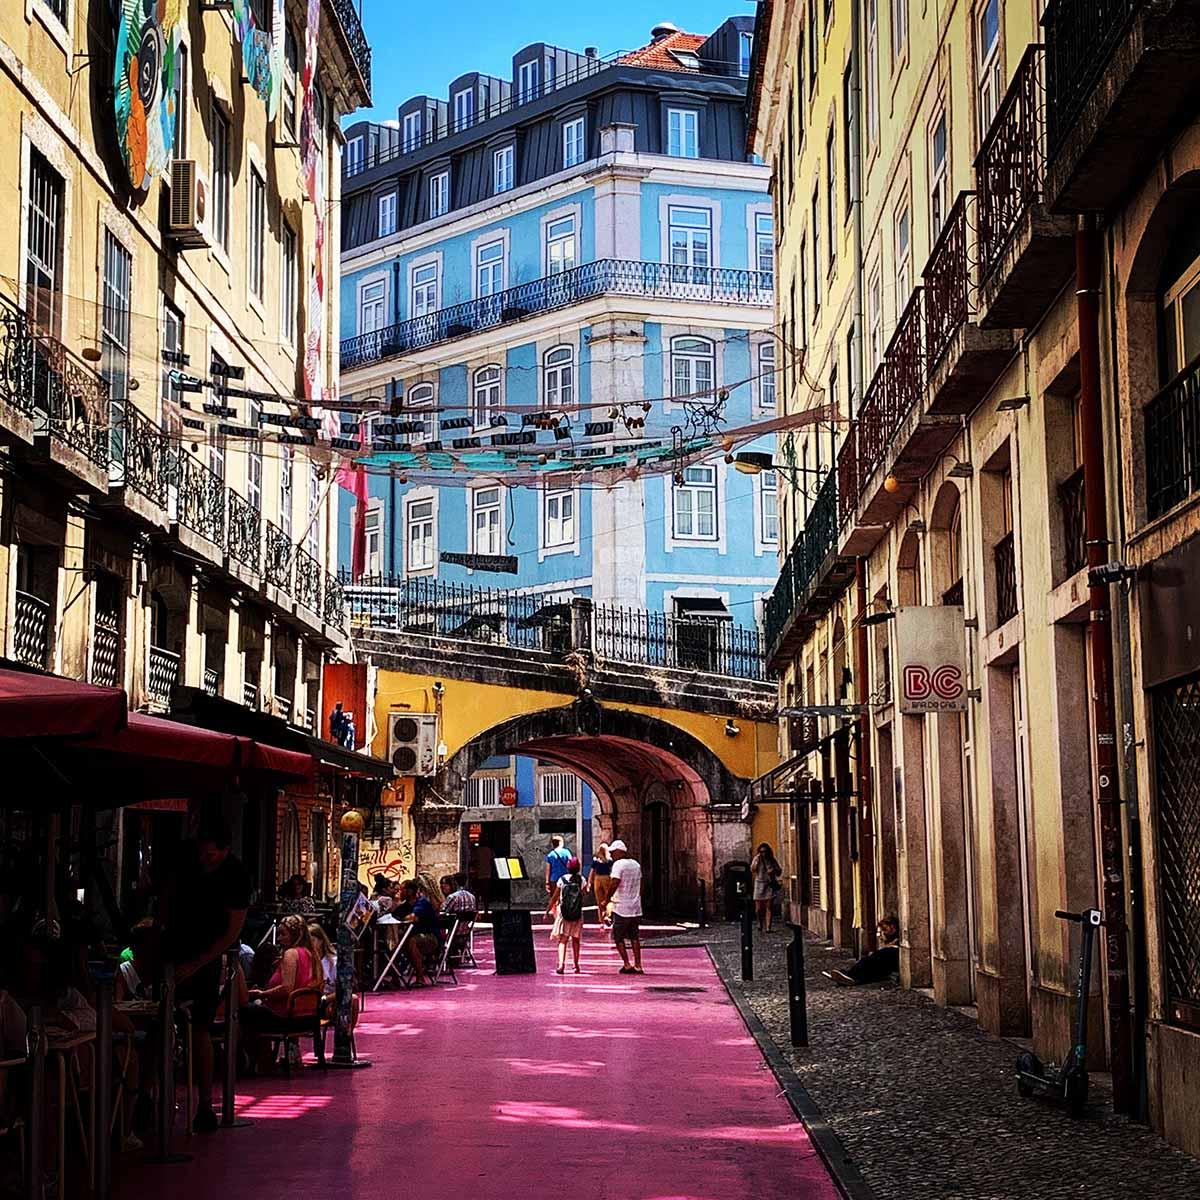 Pink Street in downtown Lisbon